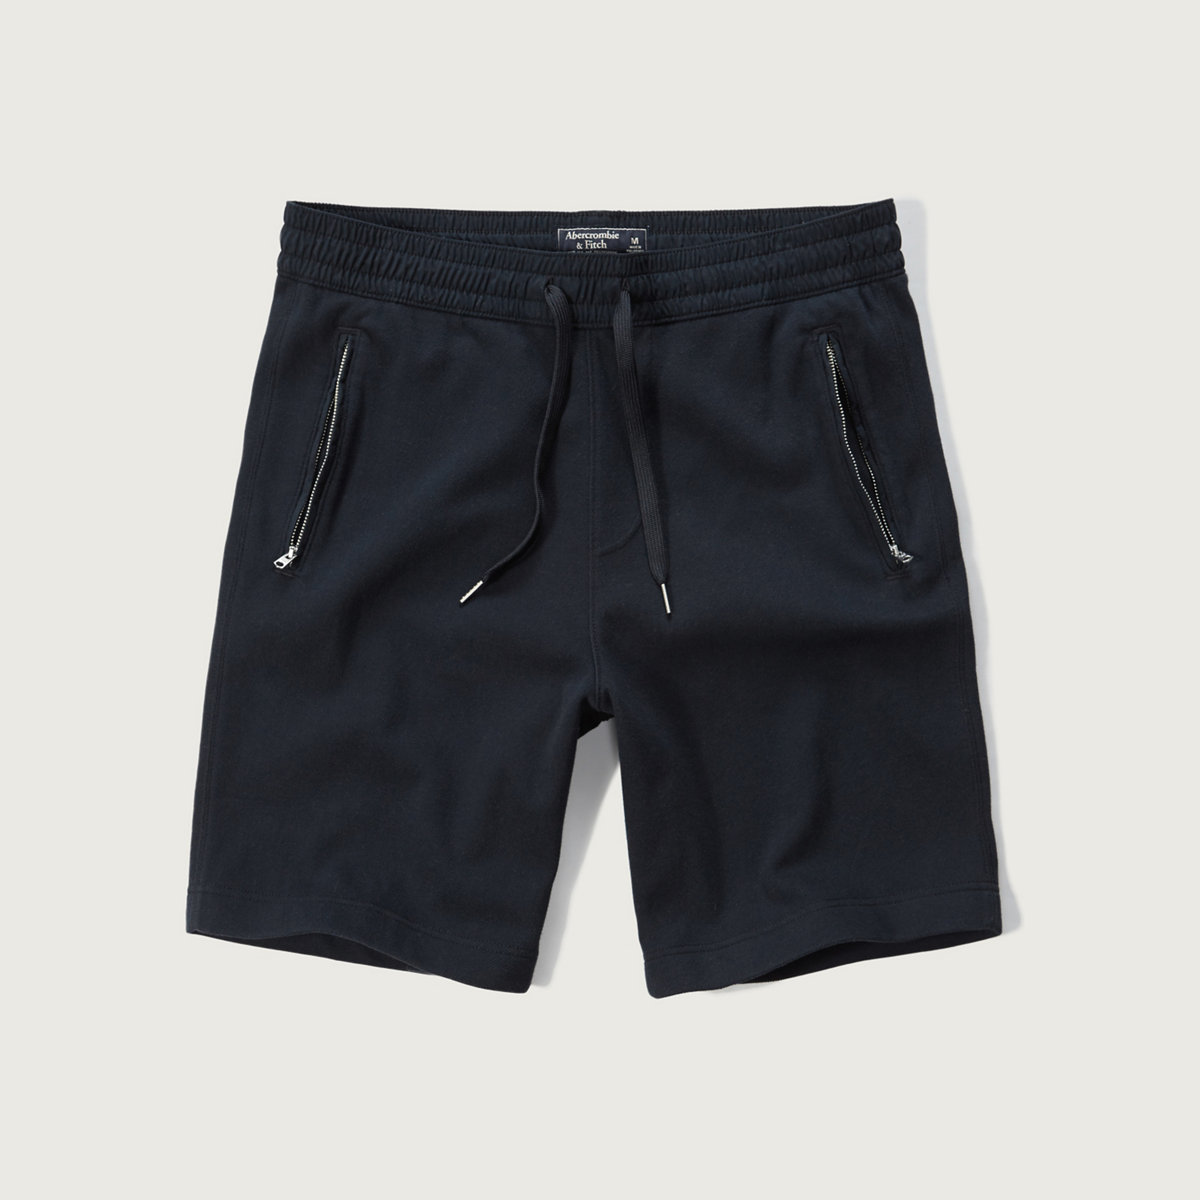 Fleece Nylon Waistband Short